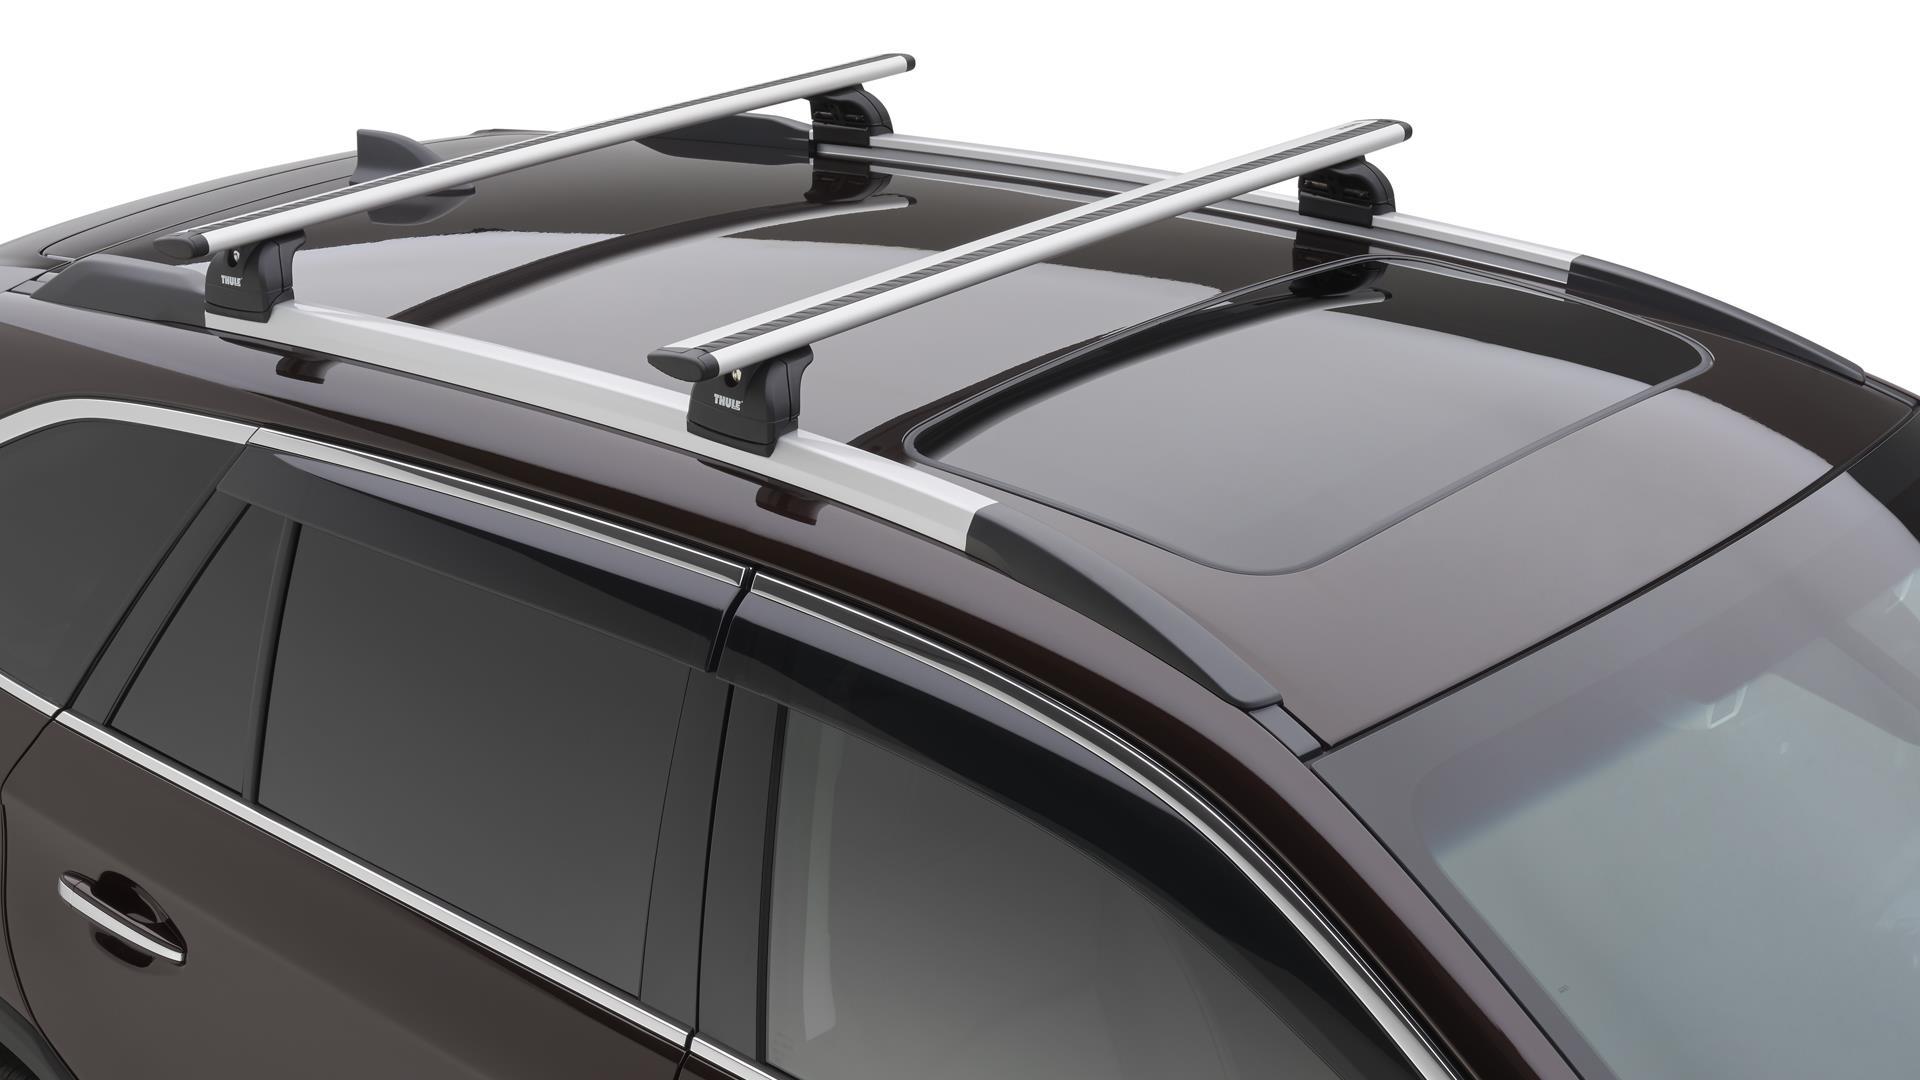 Roof Racks Subaru Outback >> Subaru Outback Kayak Rack | Upcomingcarshq.com